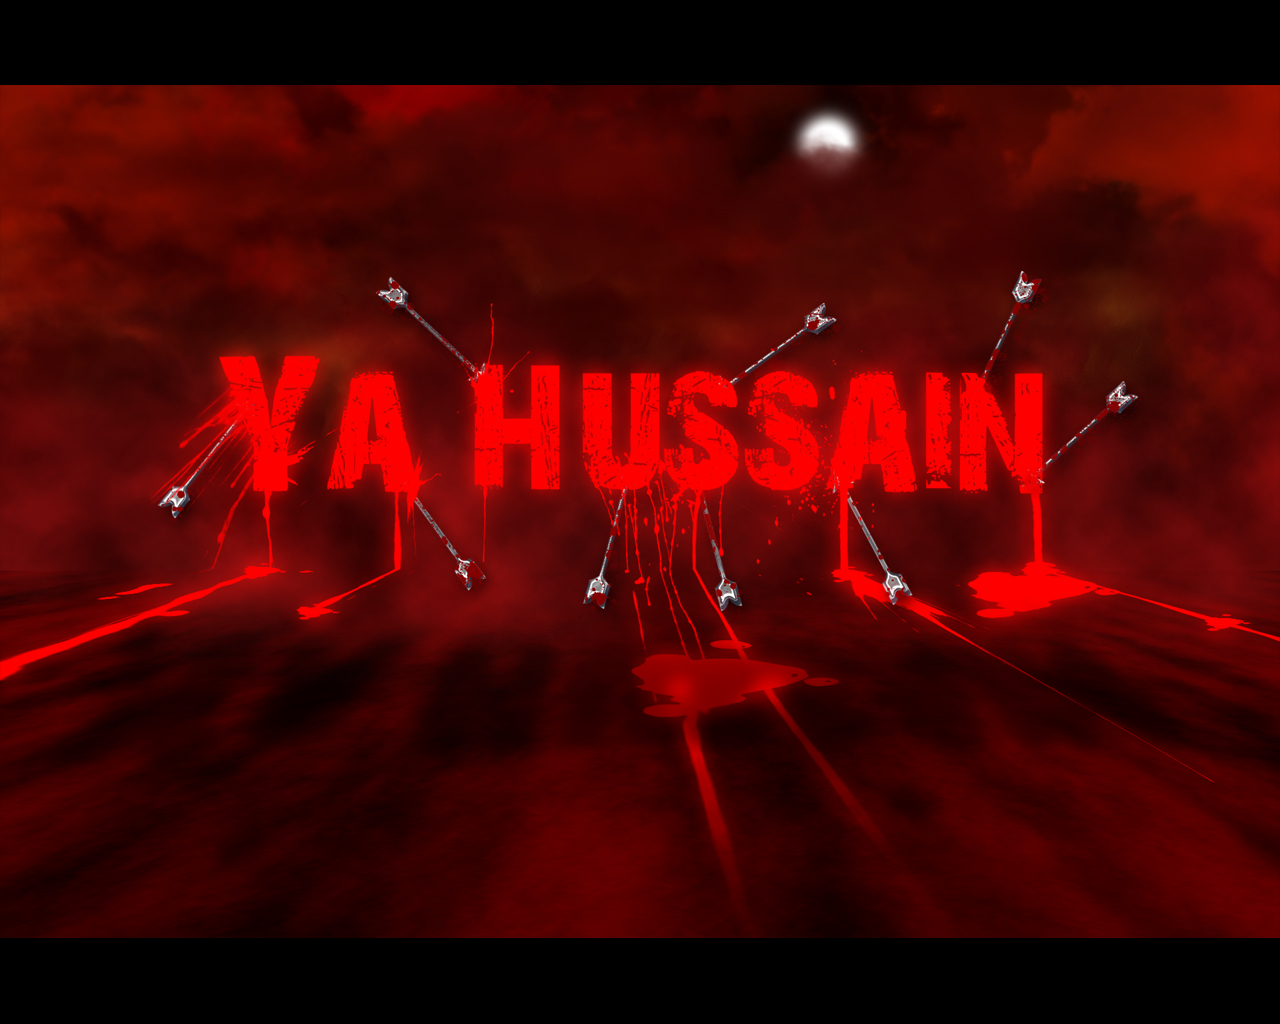 Free Download Ya Ali Ya Hussain Wallpapers Httpelsullivanocom